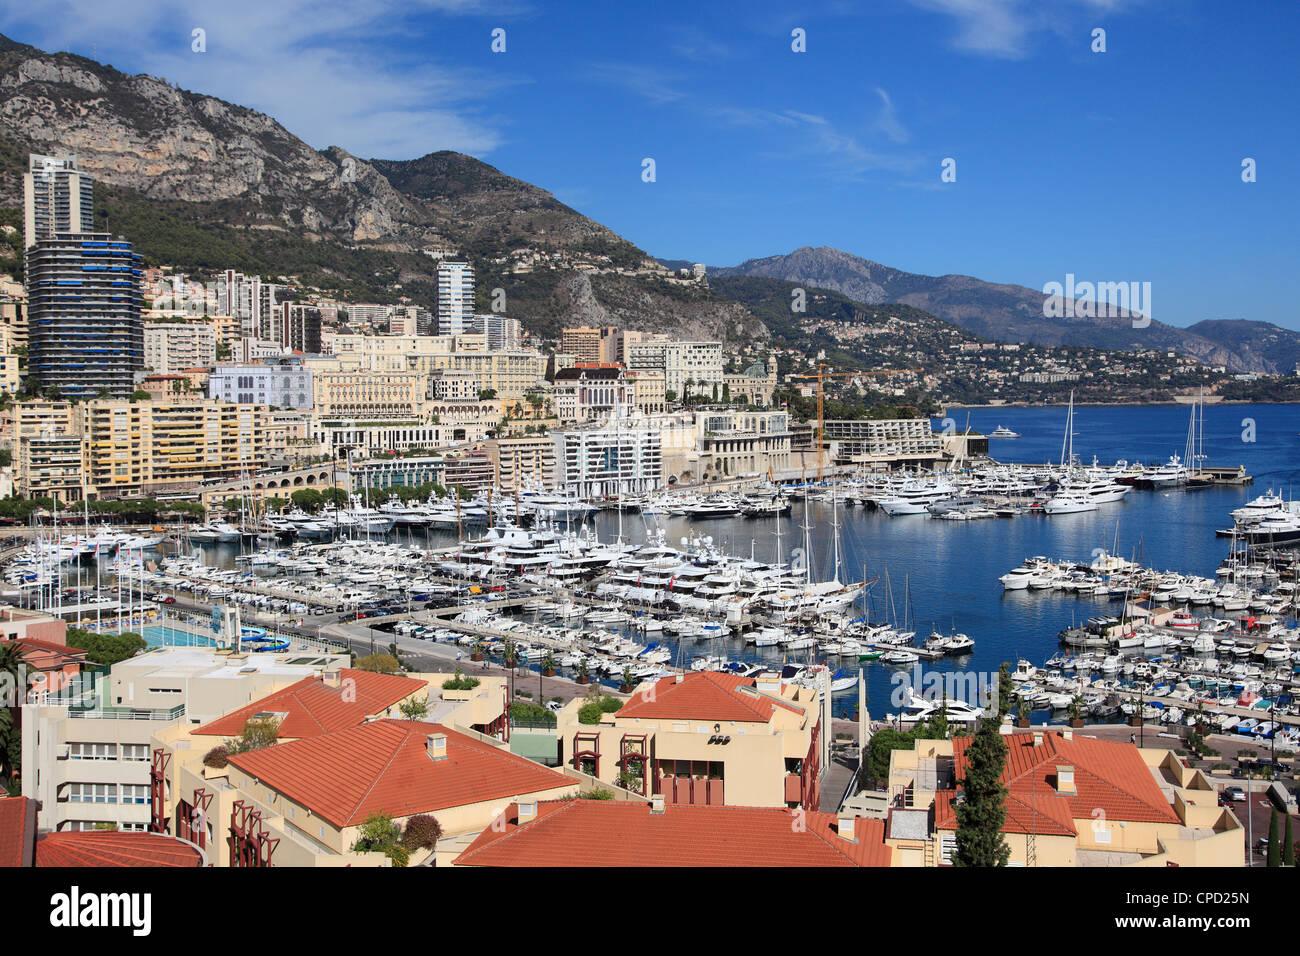 Port Hercule, Monte Carlo, Monaco, Cote d'Azur, Mediterranean, Europe - Stock Image